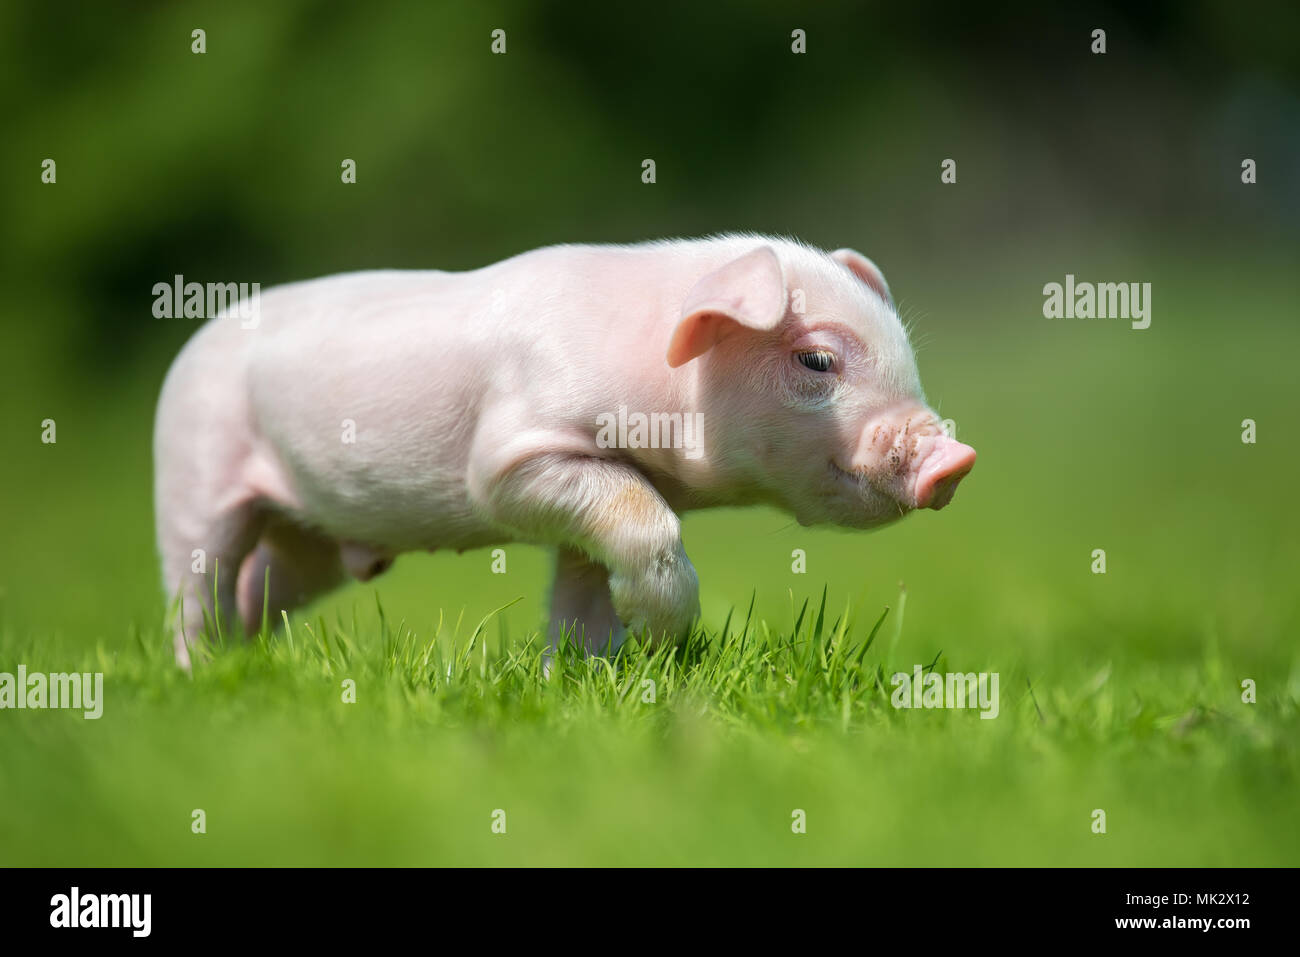 Newborn piglet on spring green grass on a farm Stock Photo